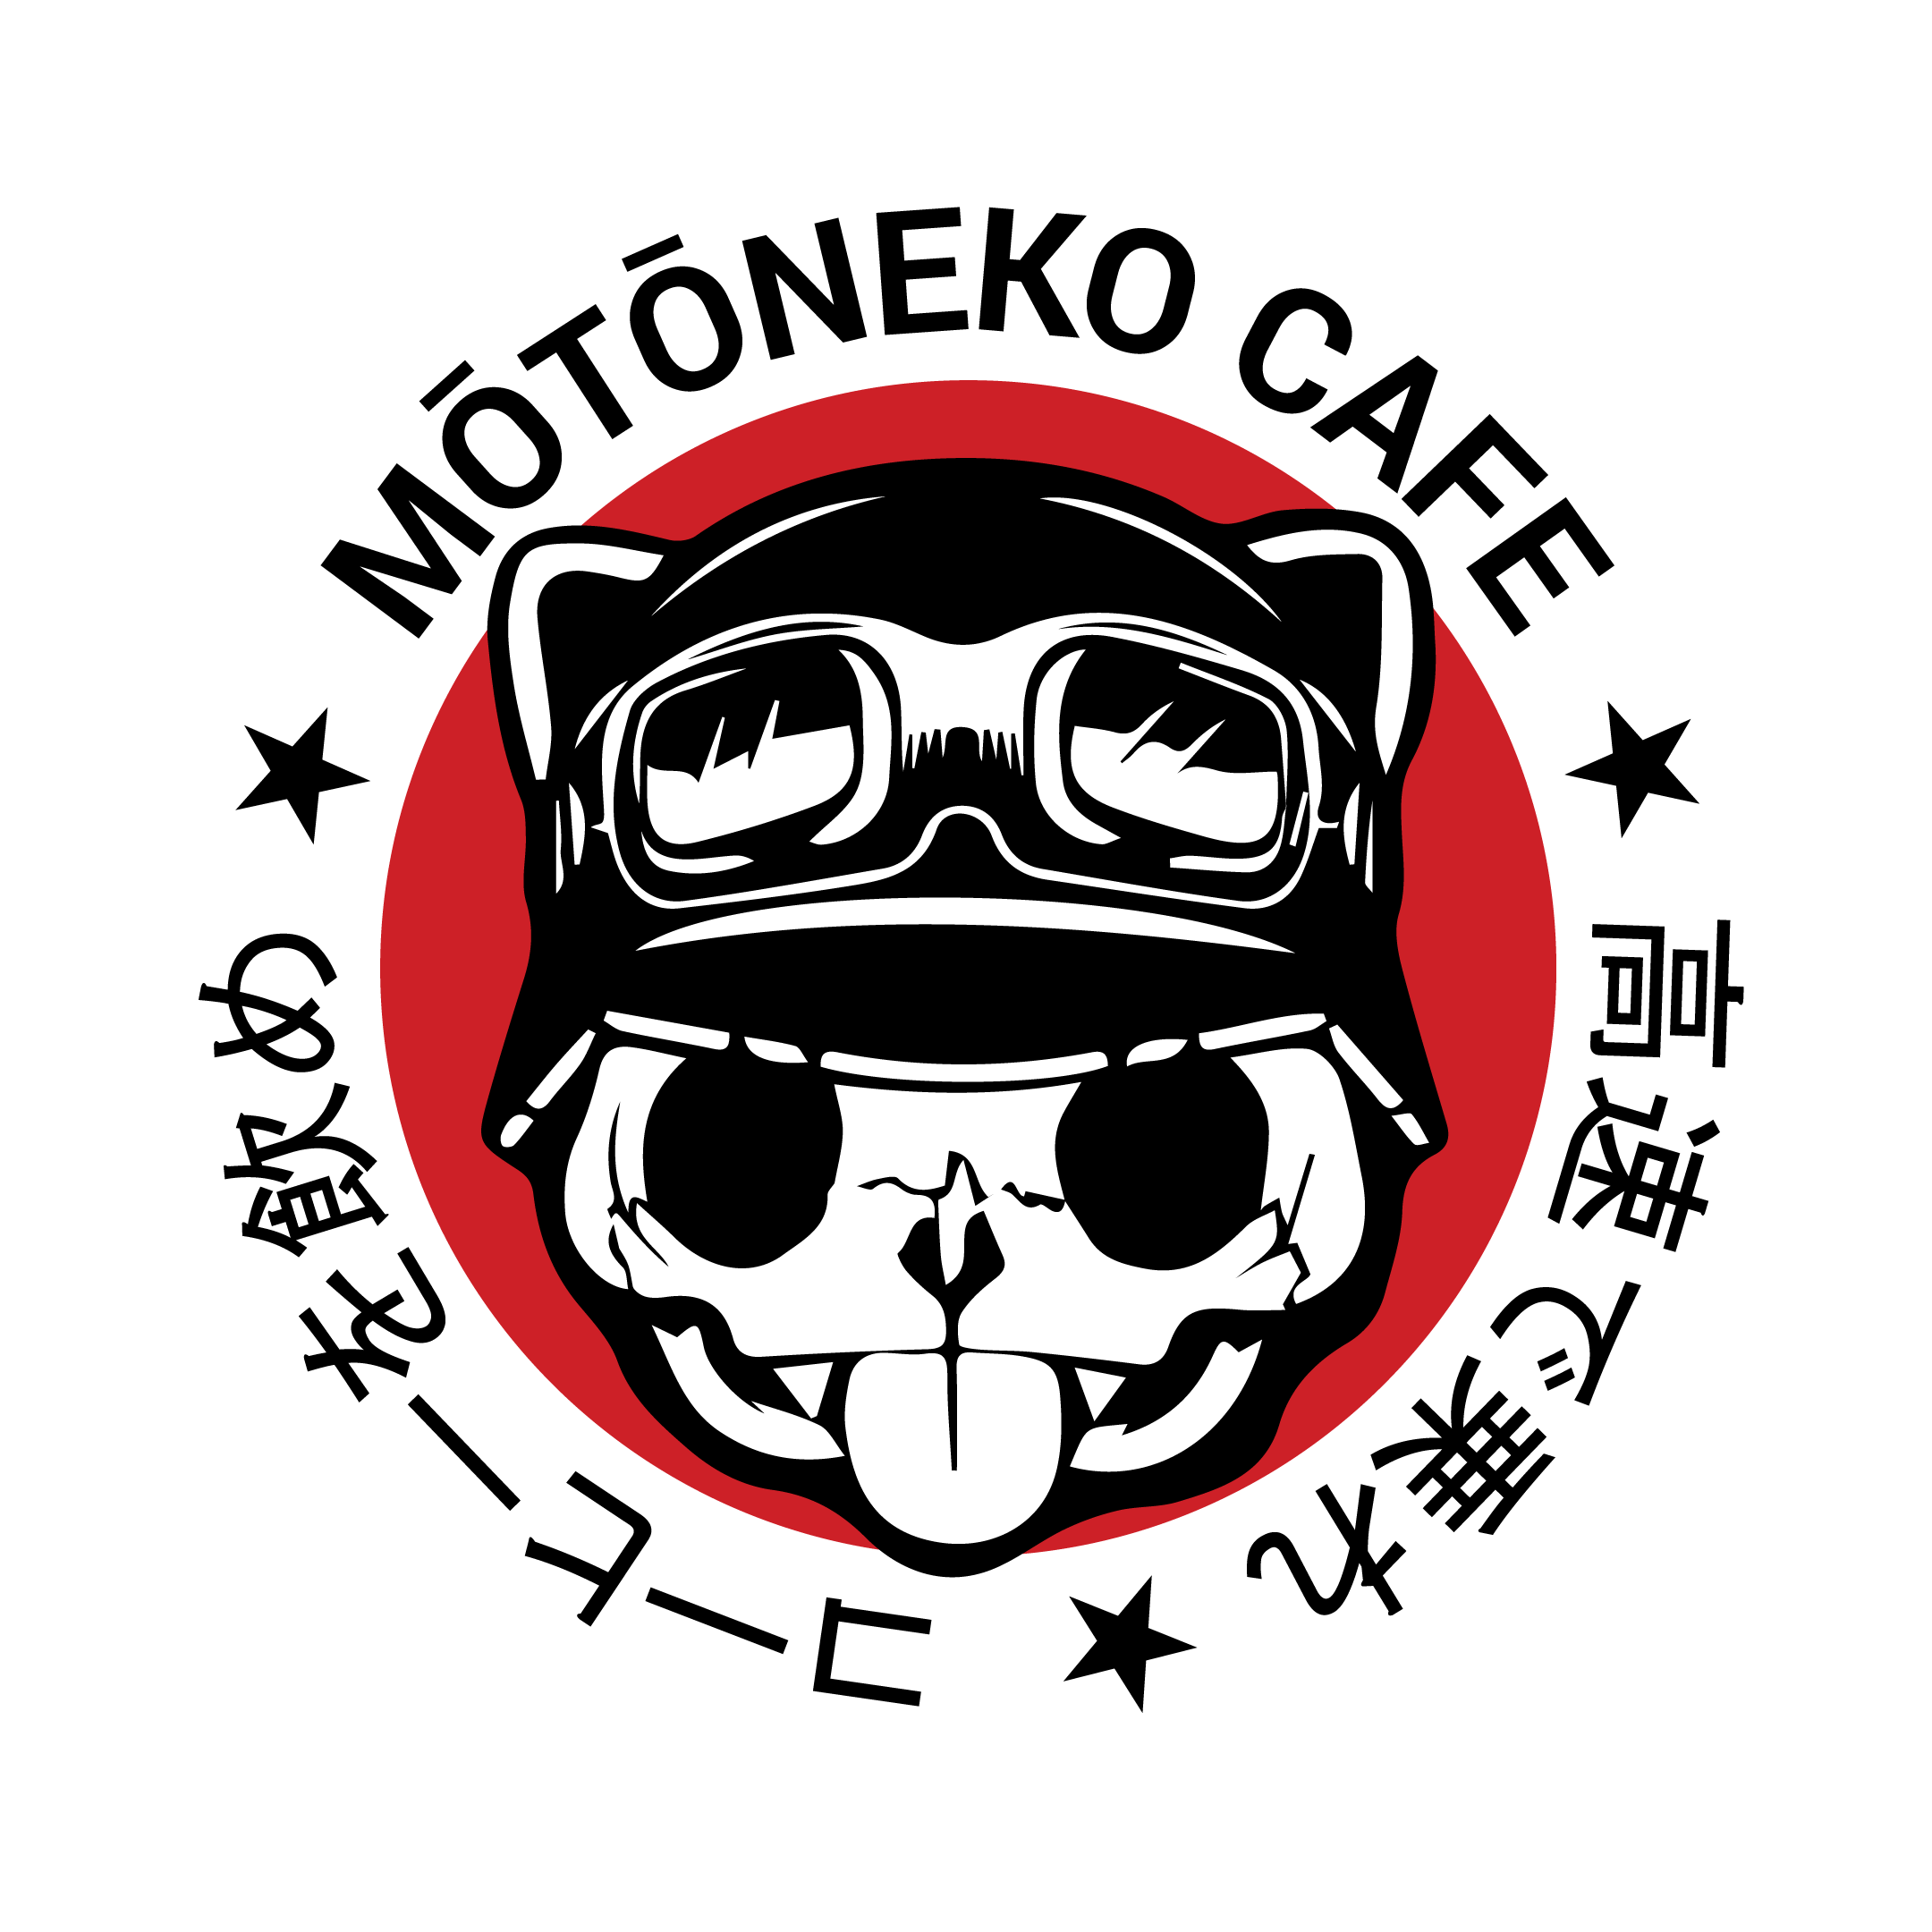 Mōtōneko